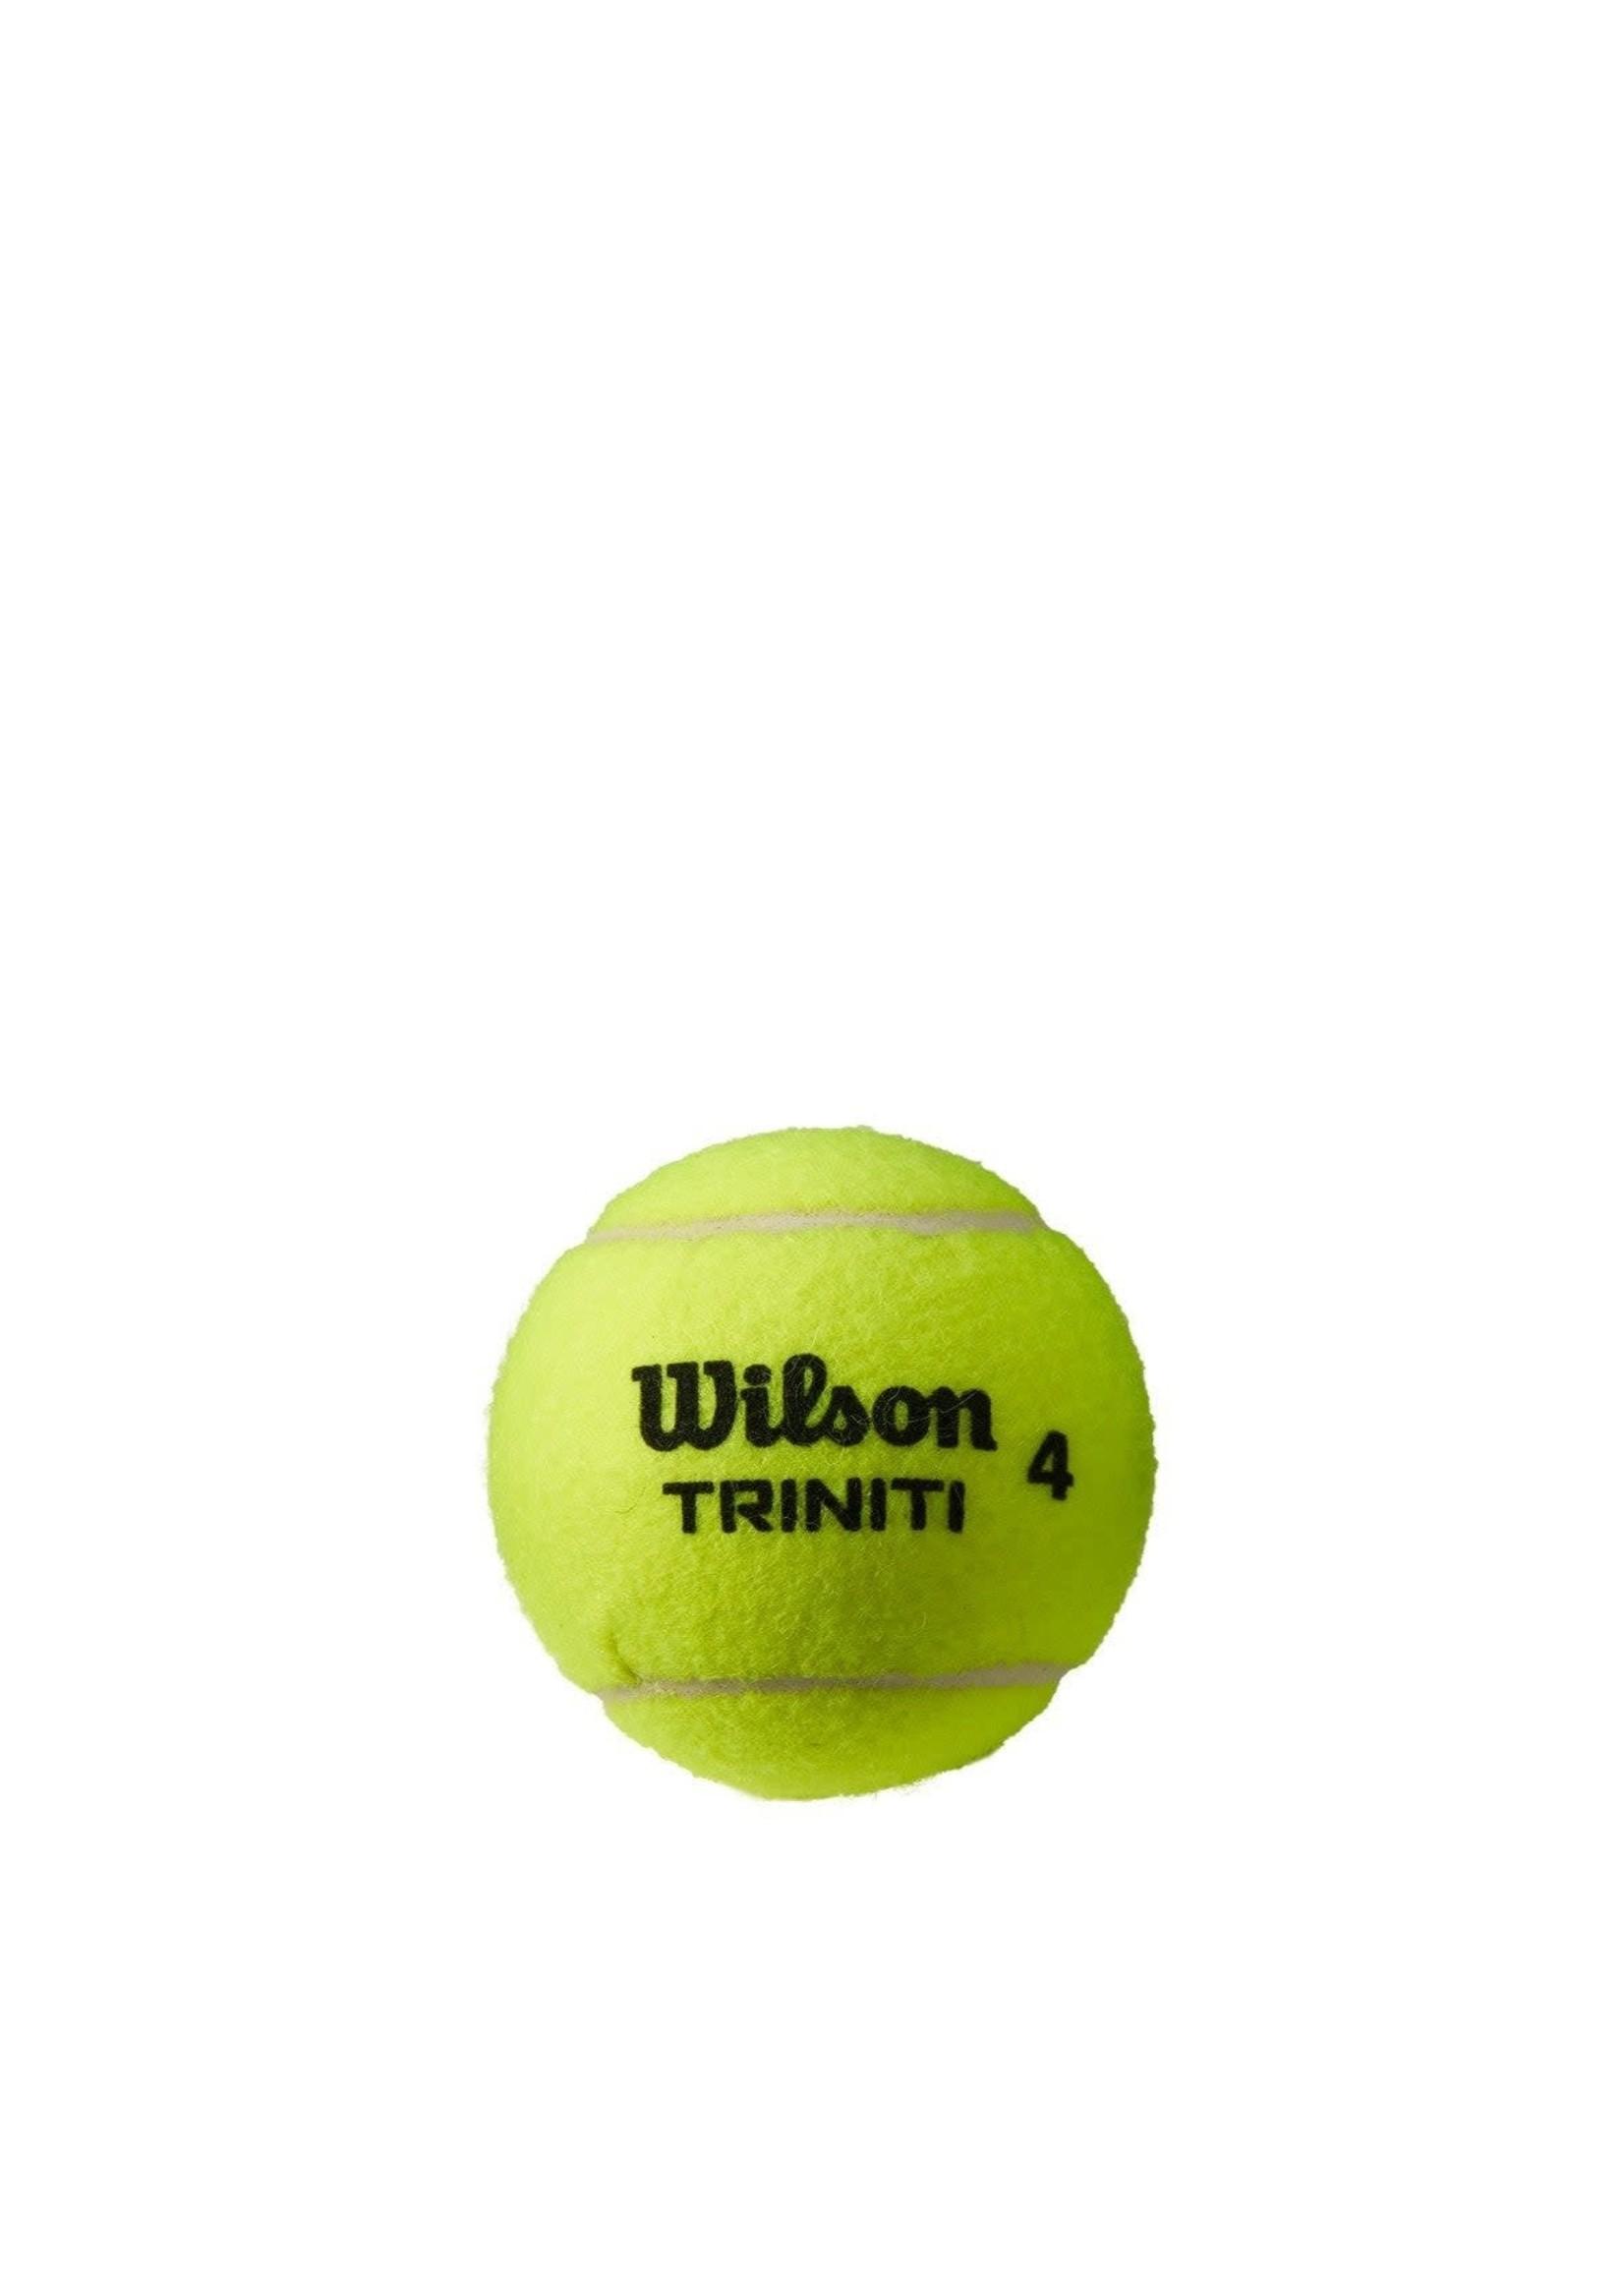 Wilson Wilson Triniti Tennis Balls [4]